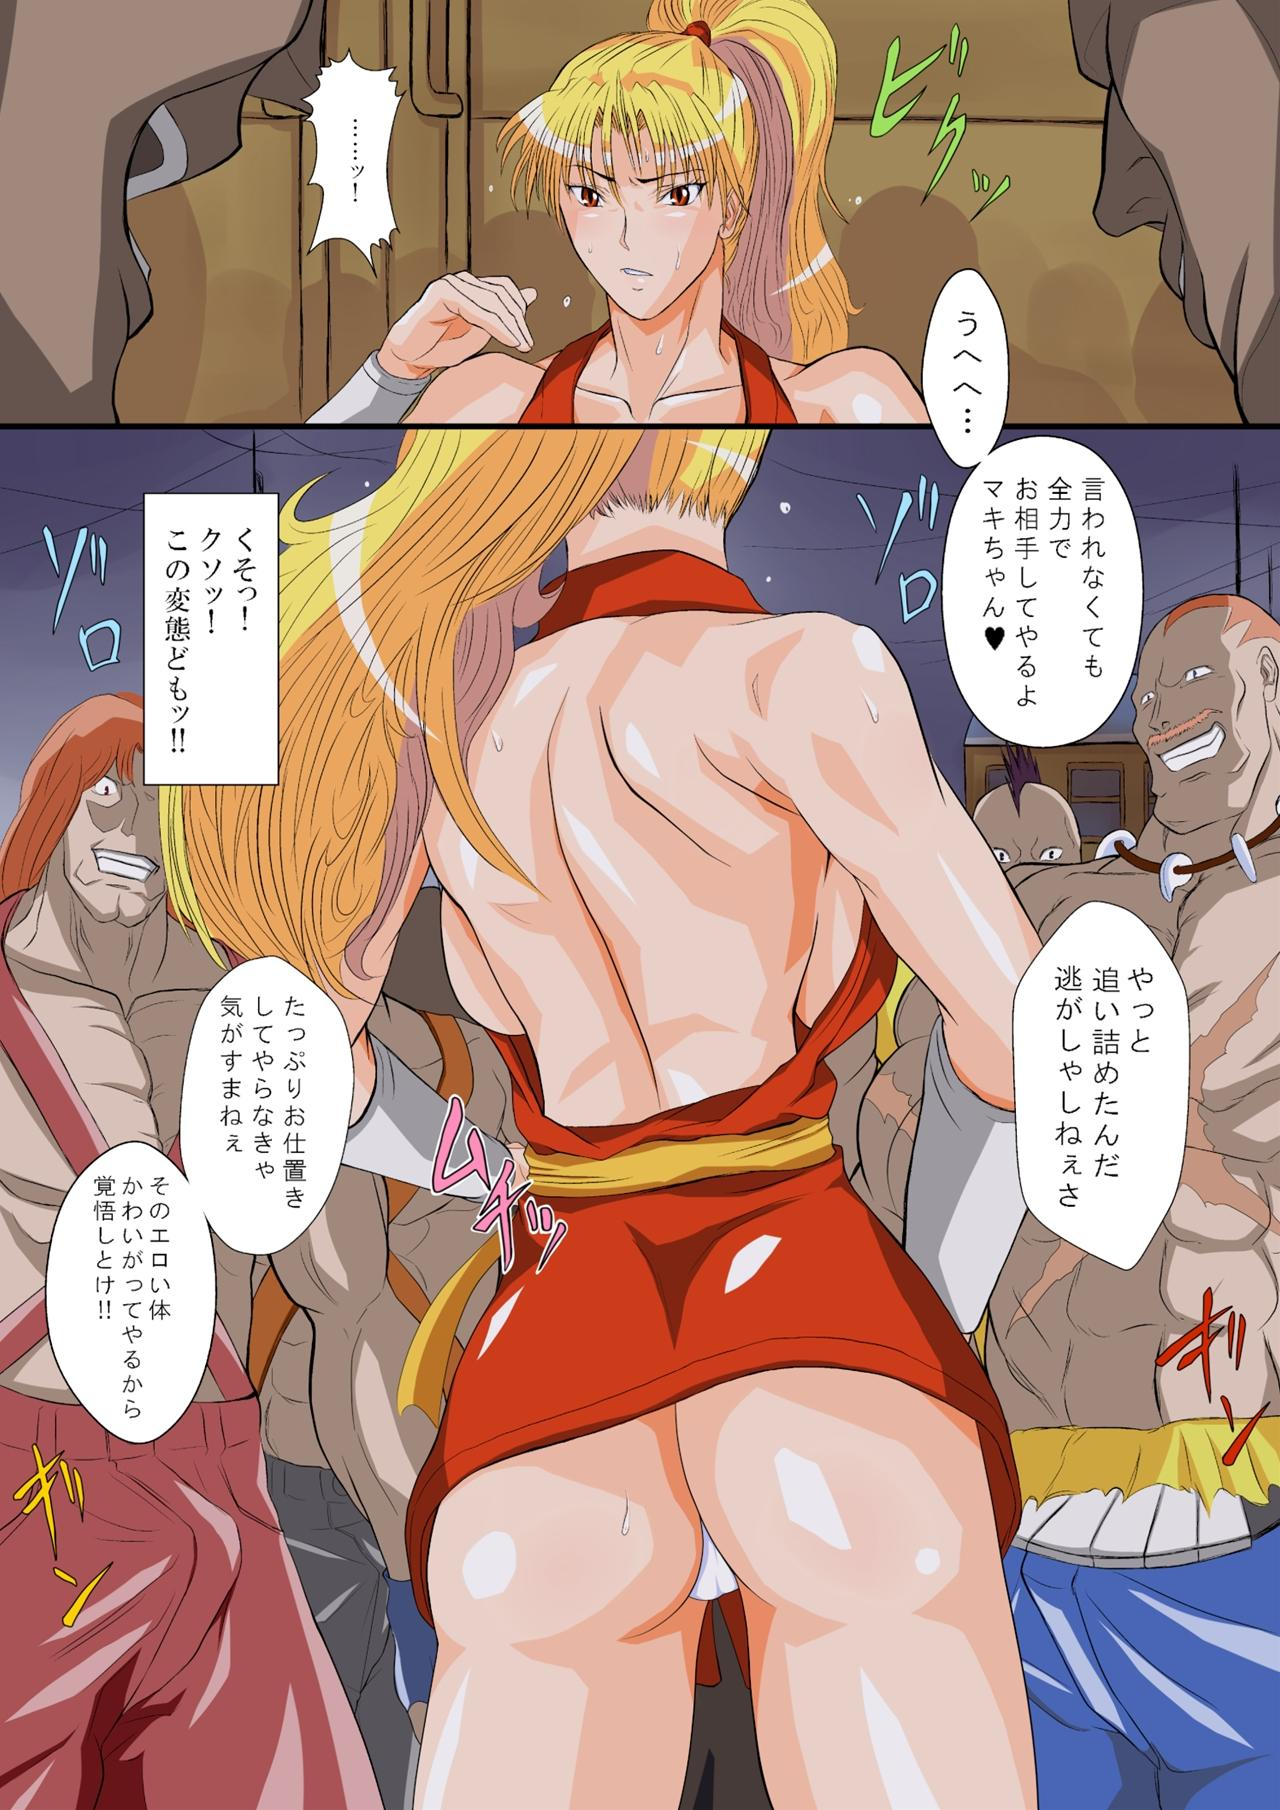 Maki's Stage 4 8